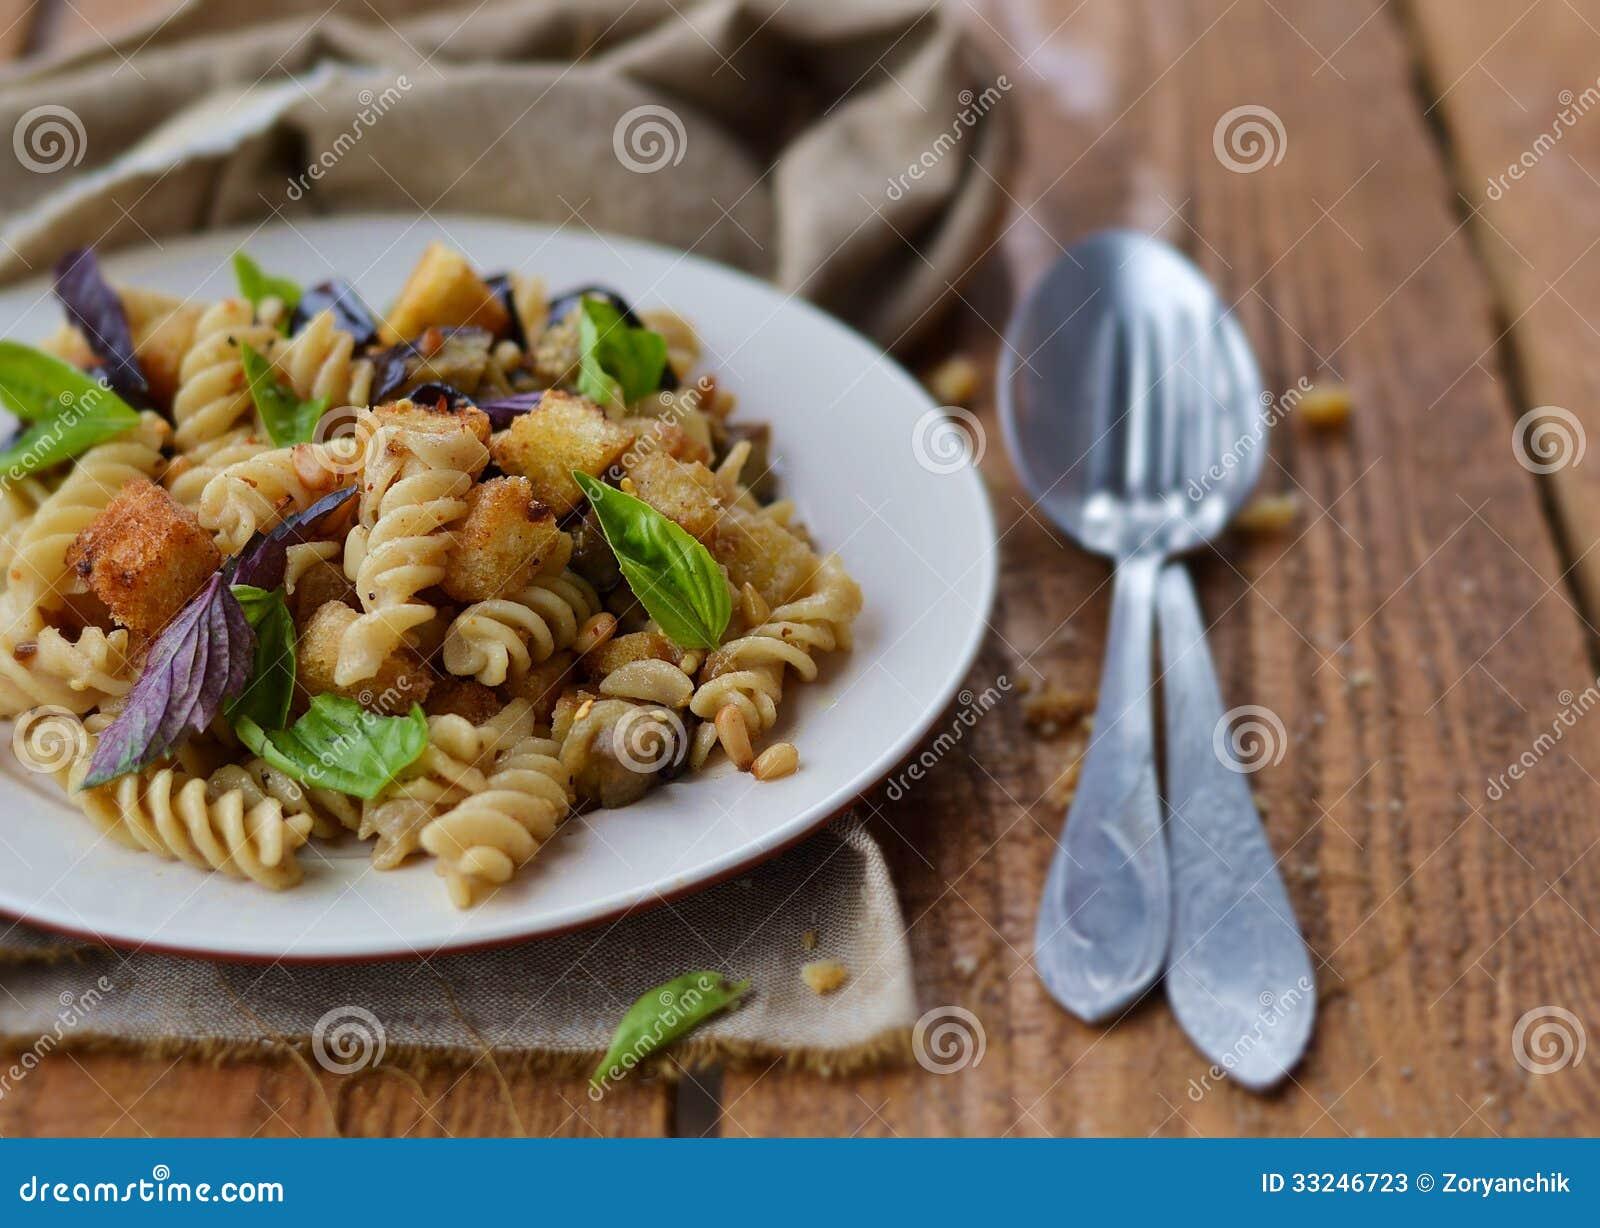 Pasta With Eggplant Stock Photos - Image: 33246723